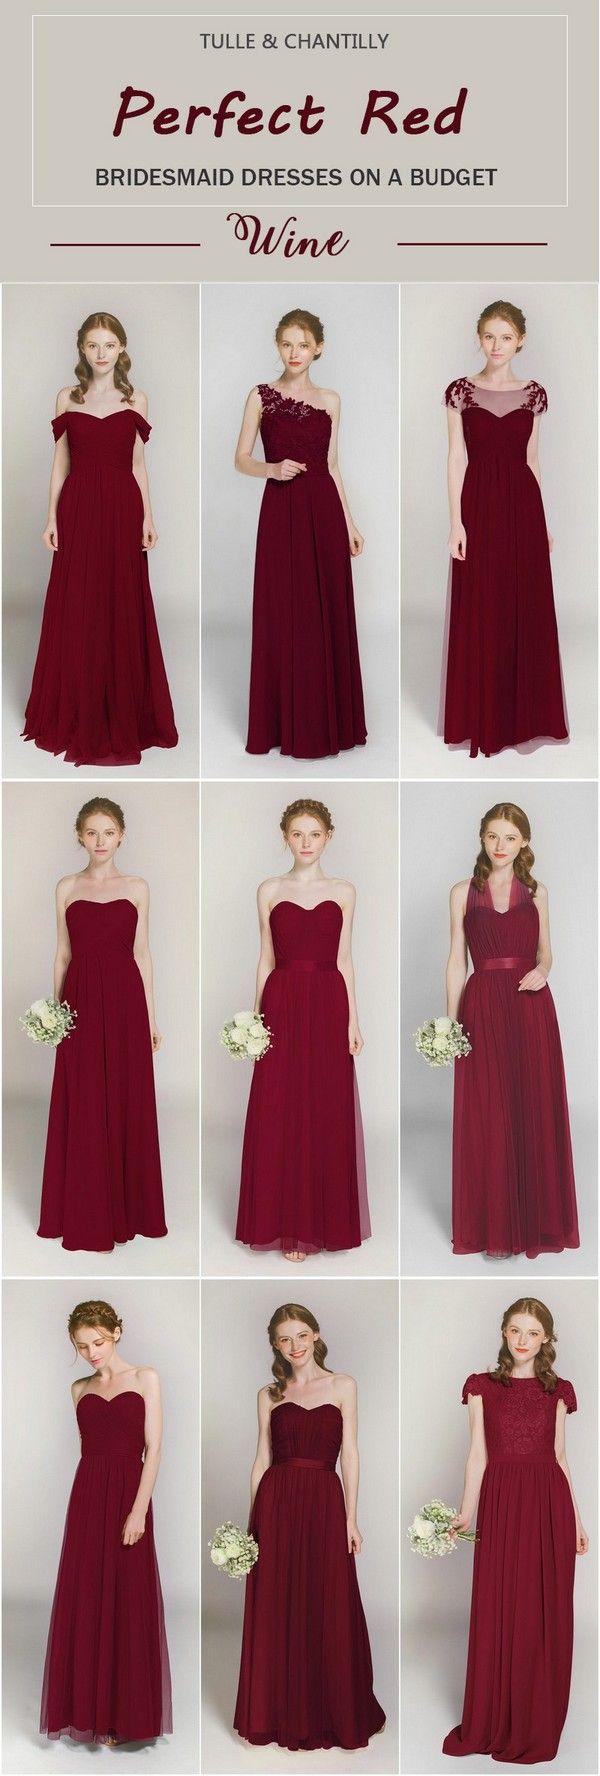 Burgundy wine maroon red bridesmaid dresses bridesmaid